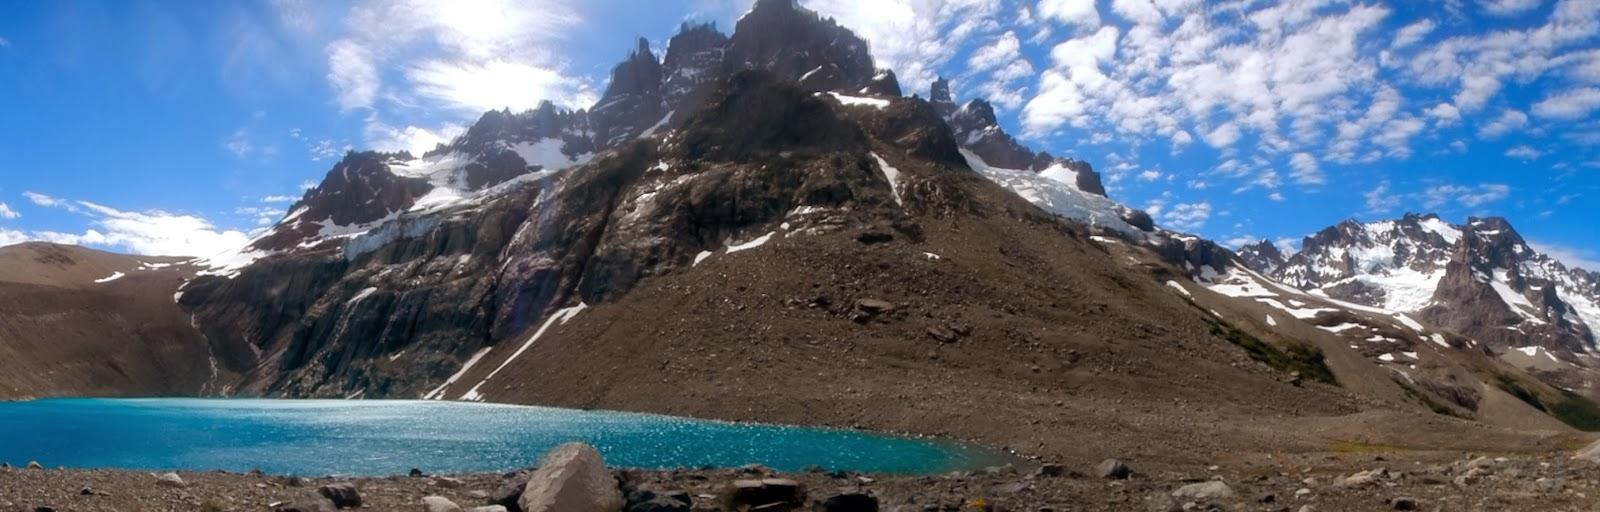 Лагуна и горы